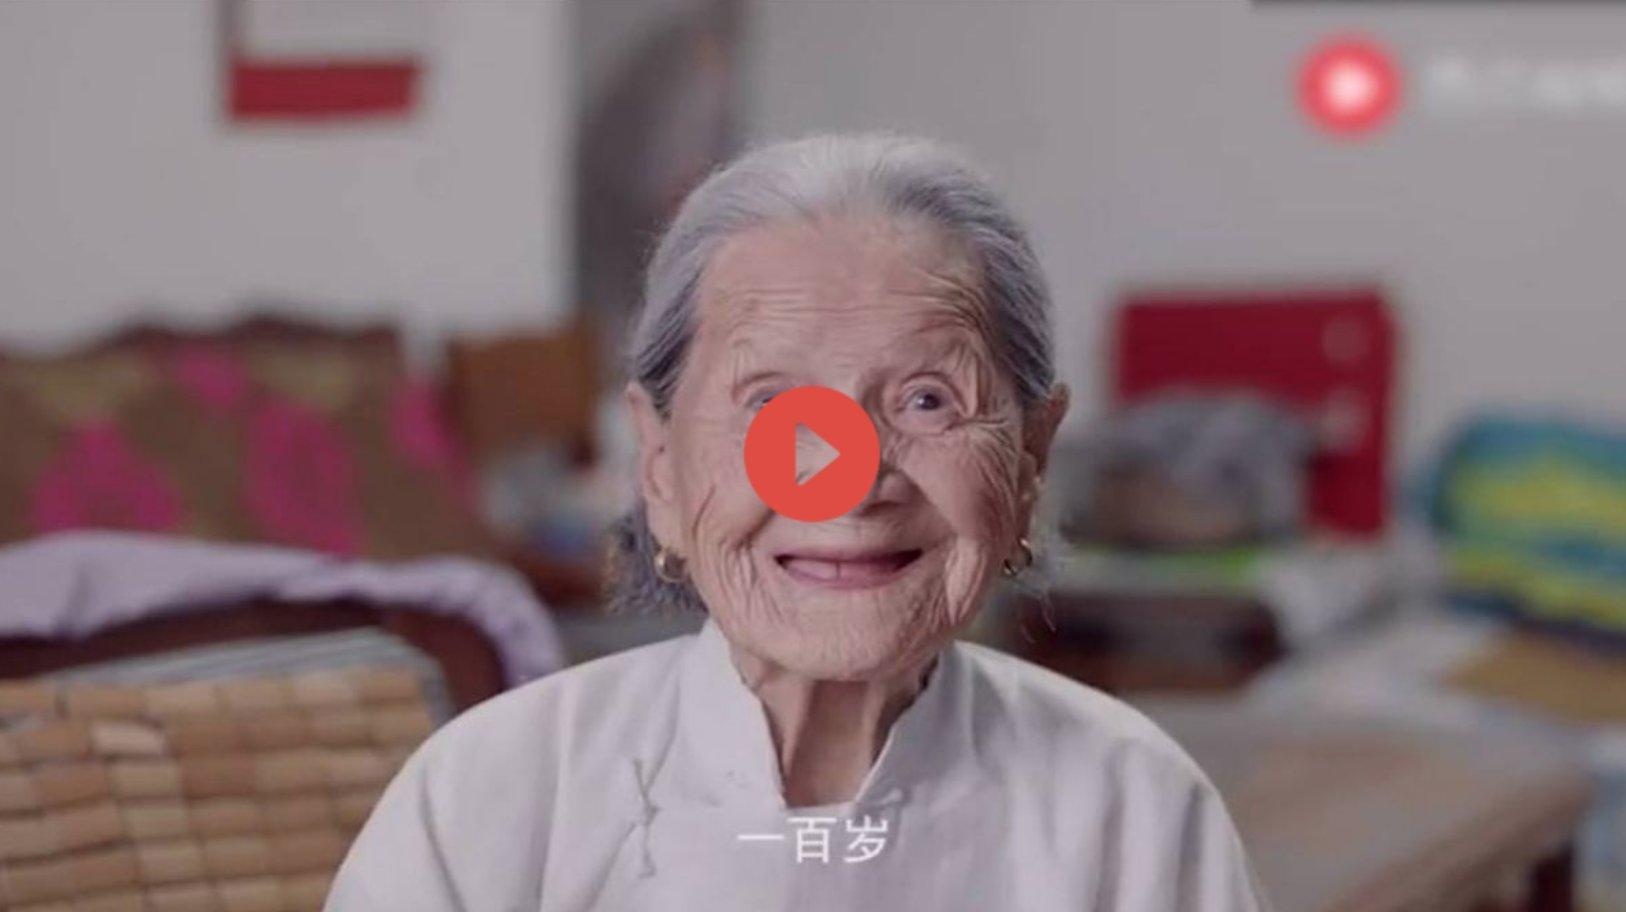 screen shot 2018 10 04 at 3 04 48 pm.png?resize=648,365 - 120秒紀錄女性1-100歲變化...網友鼻酸感嘆:「這就是人生啊~」